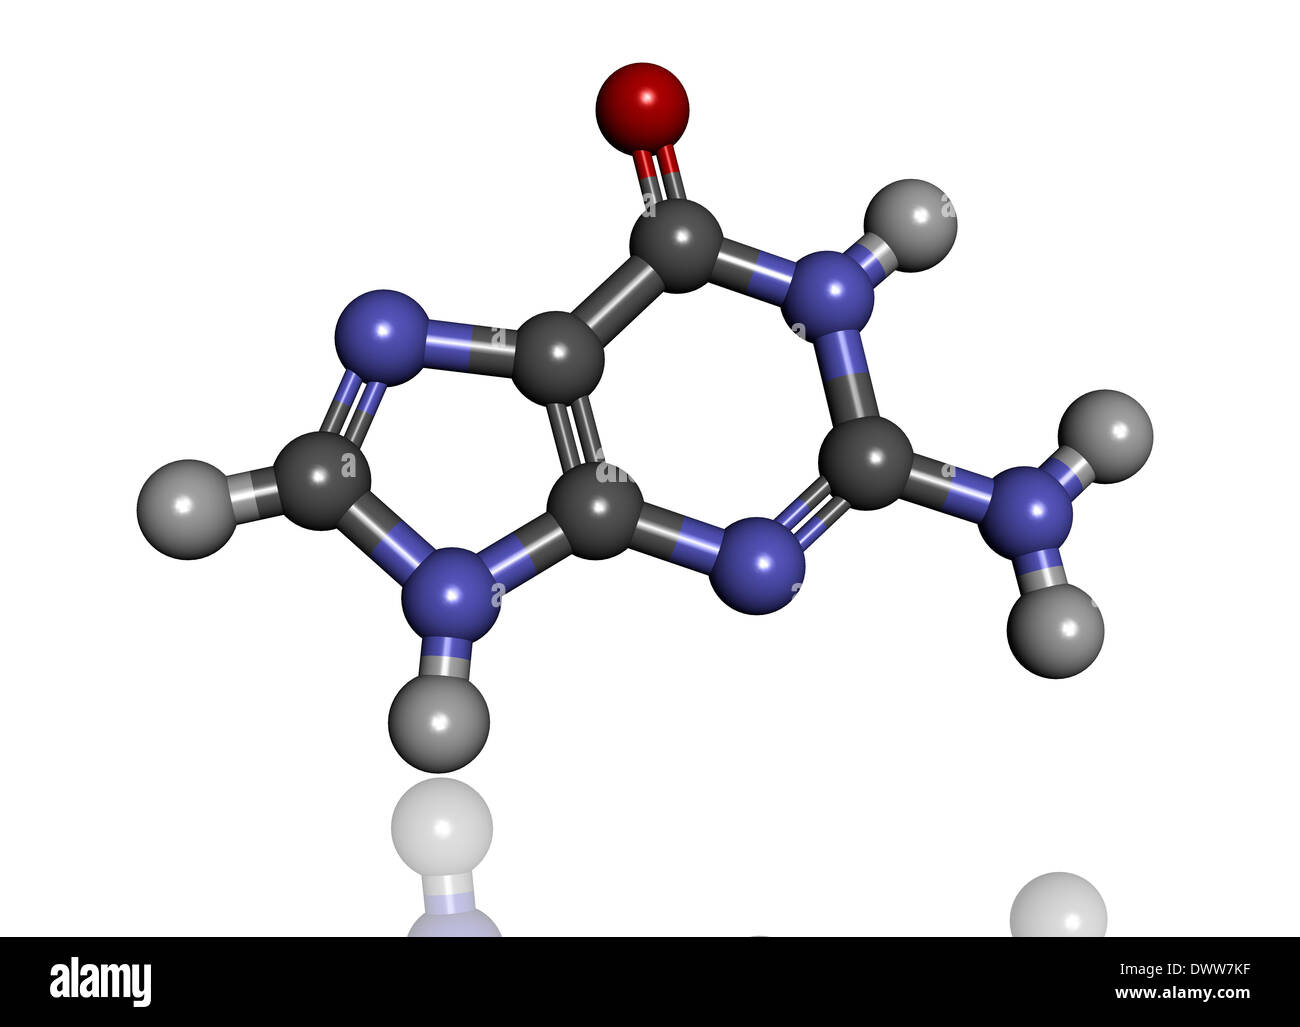 Guanine molecule - Stock Image